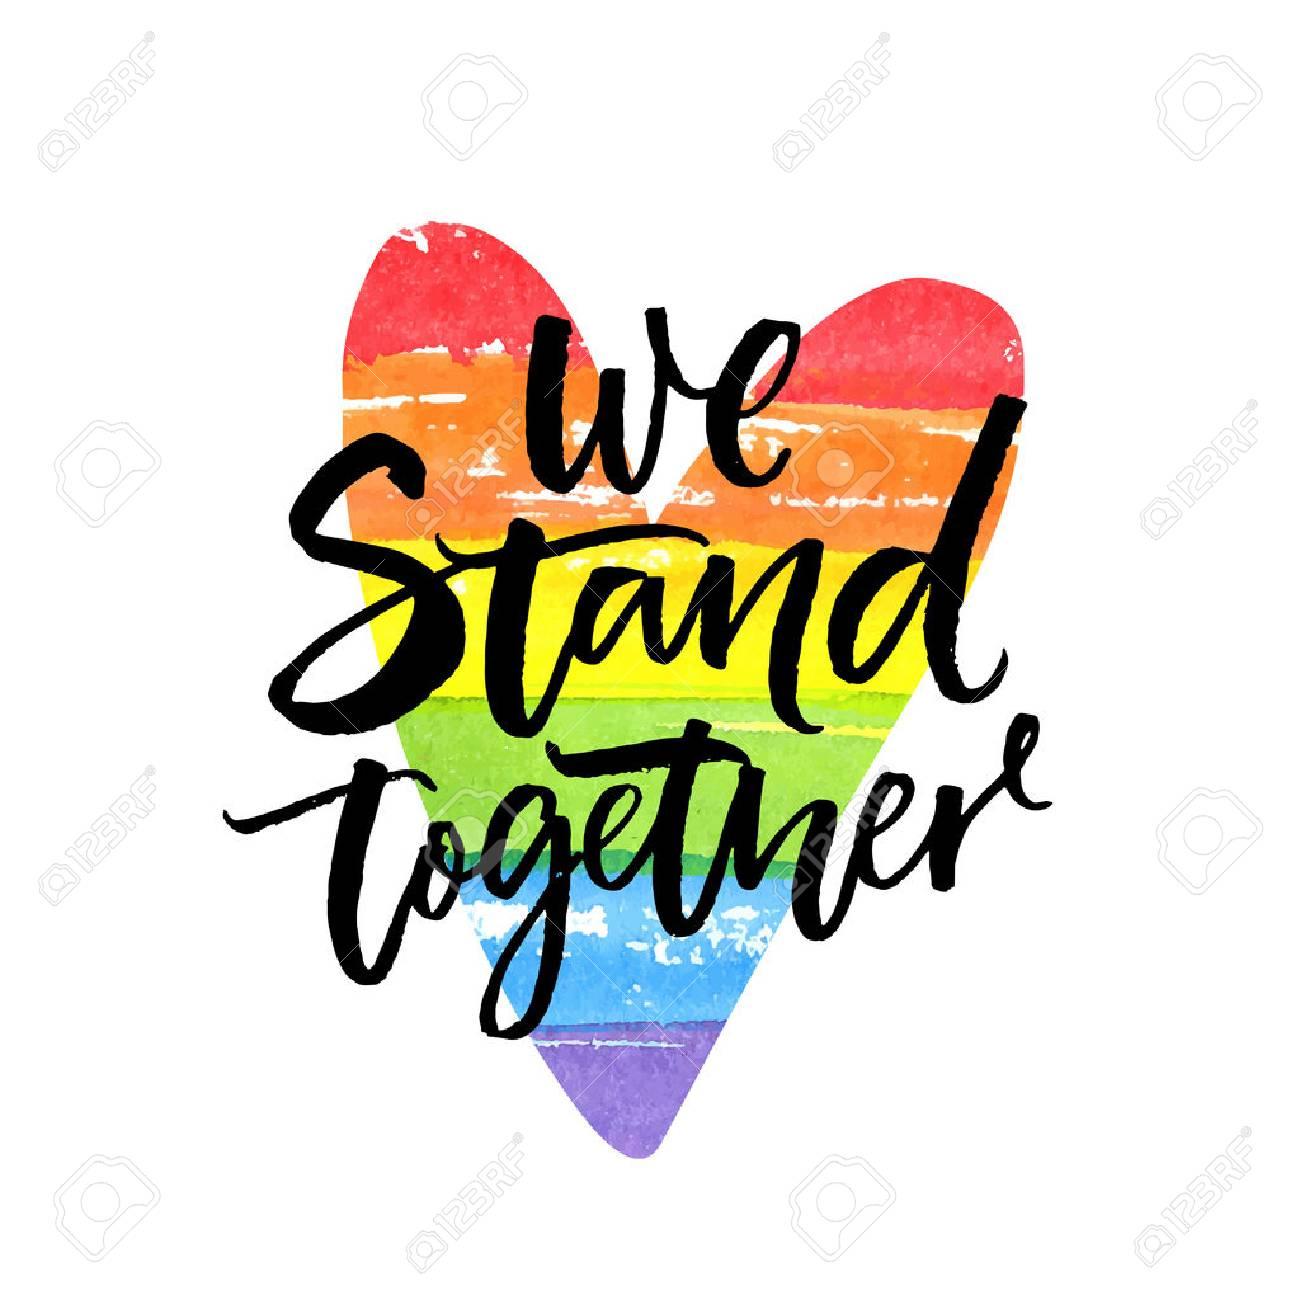 We stand together. Inspirational LGBT slogan han dwritten on rainbow flag heart. - 93880114